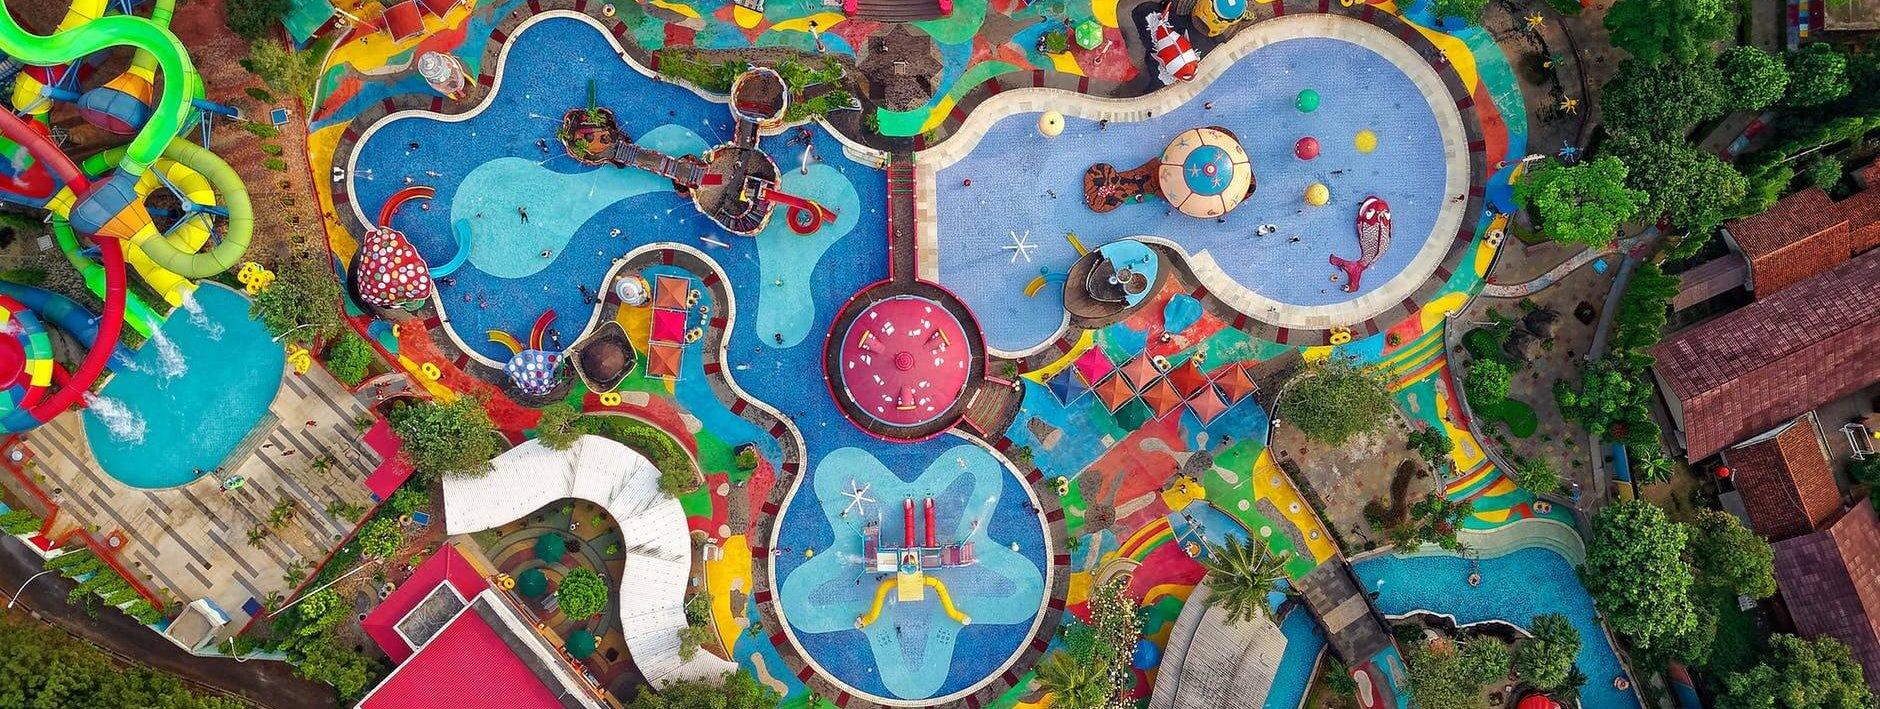 Bird free water park